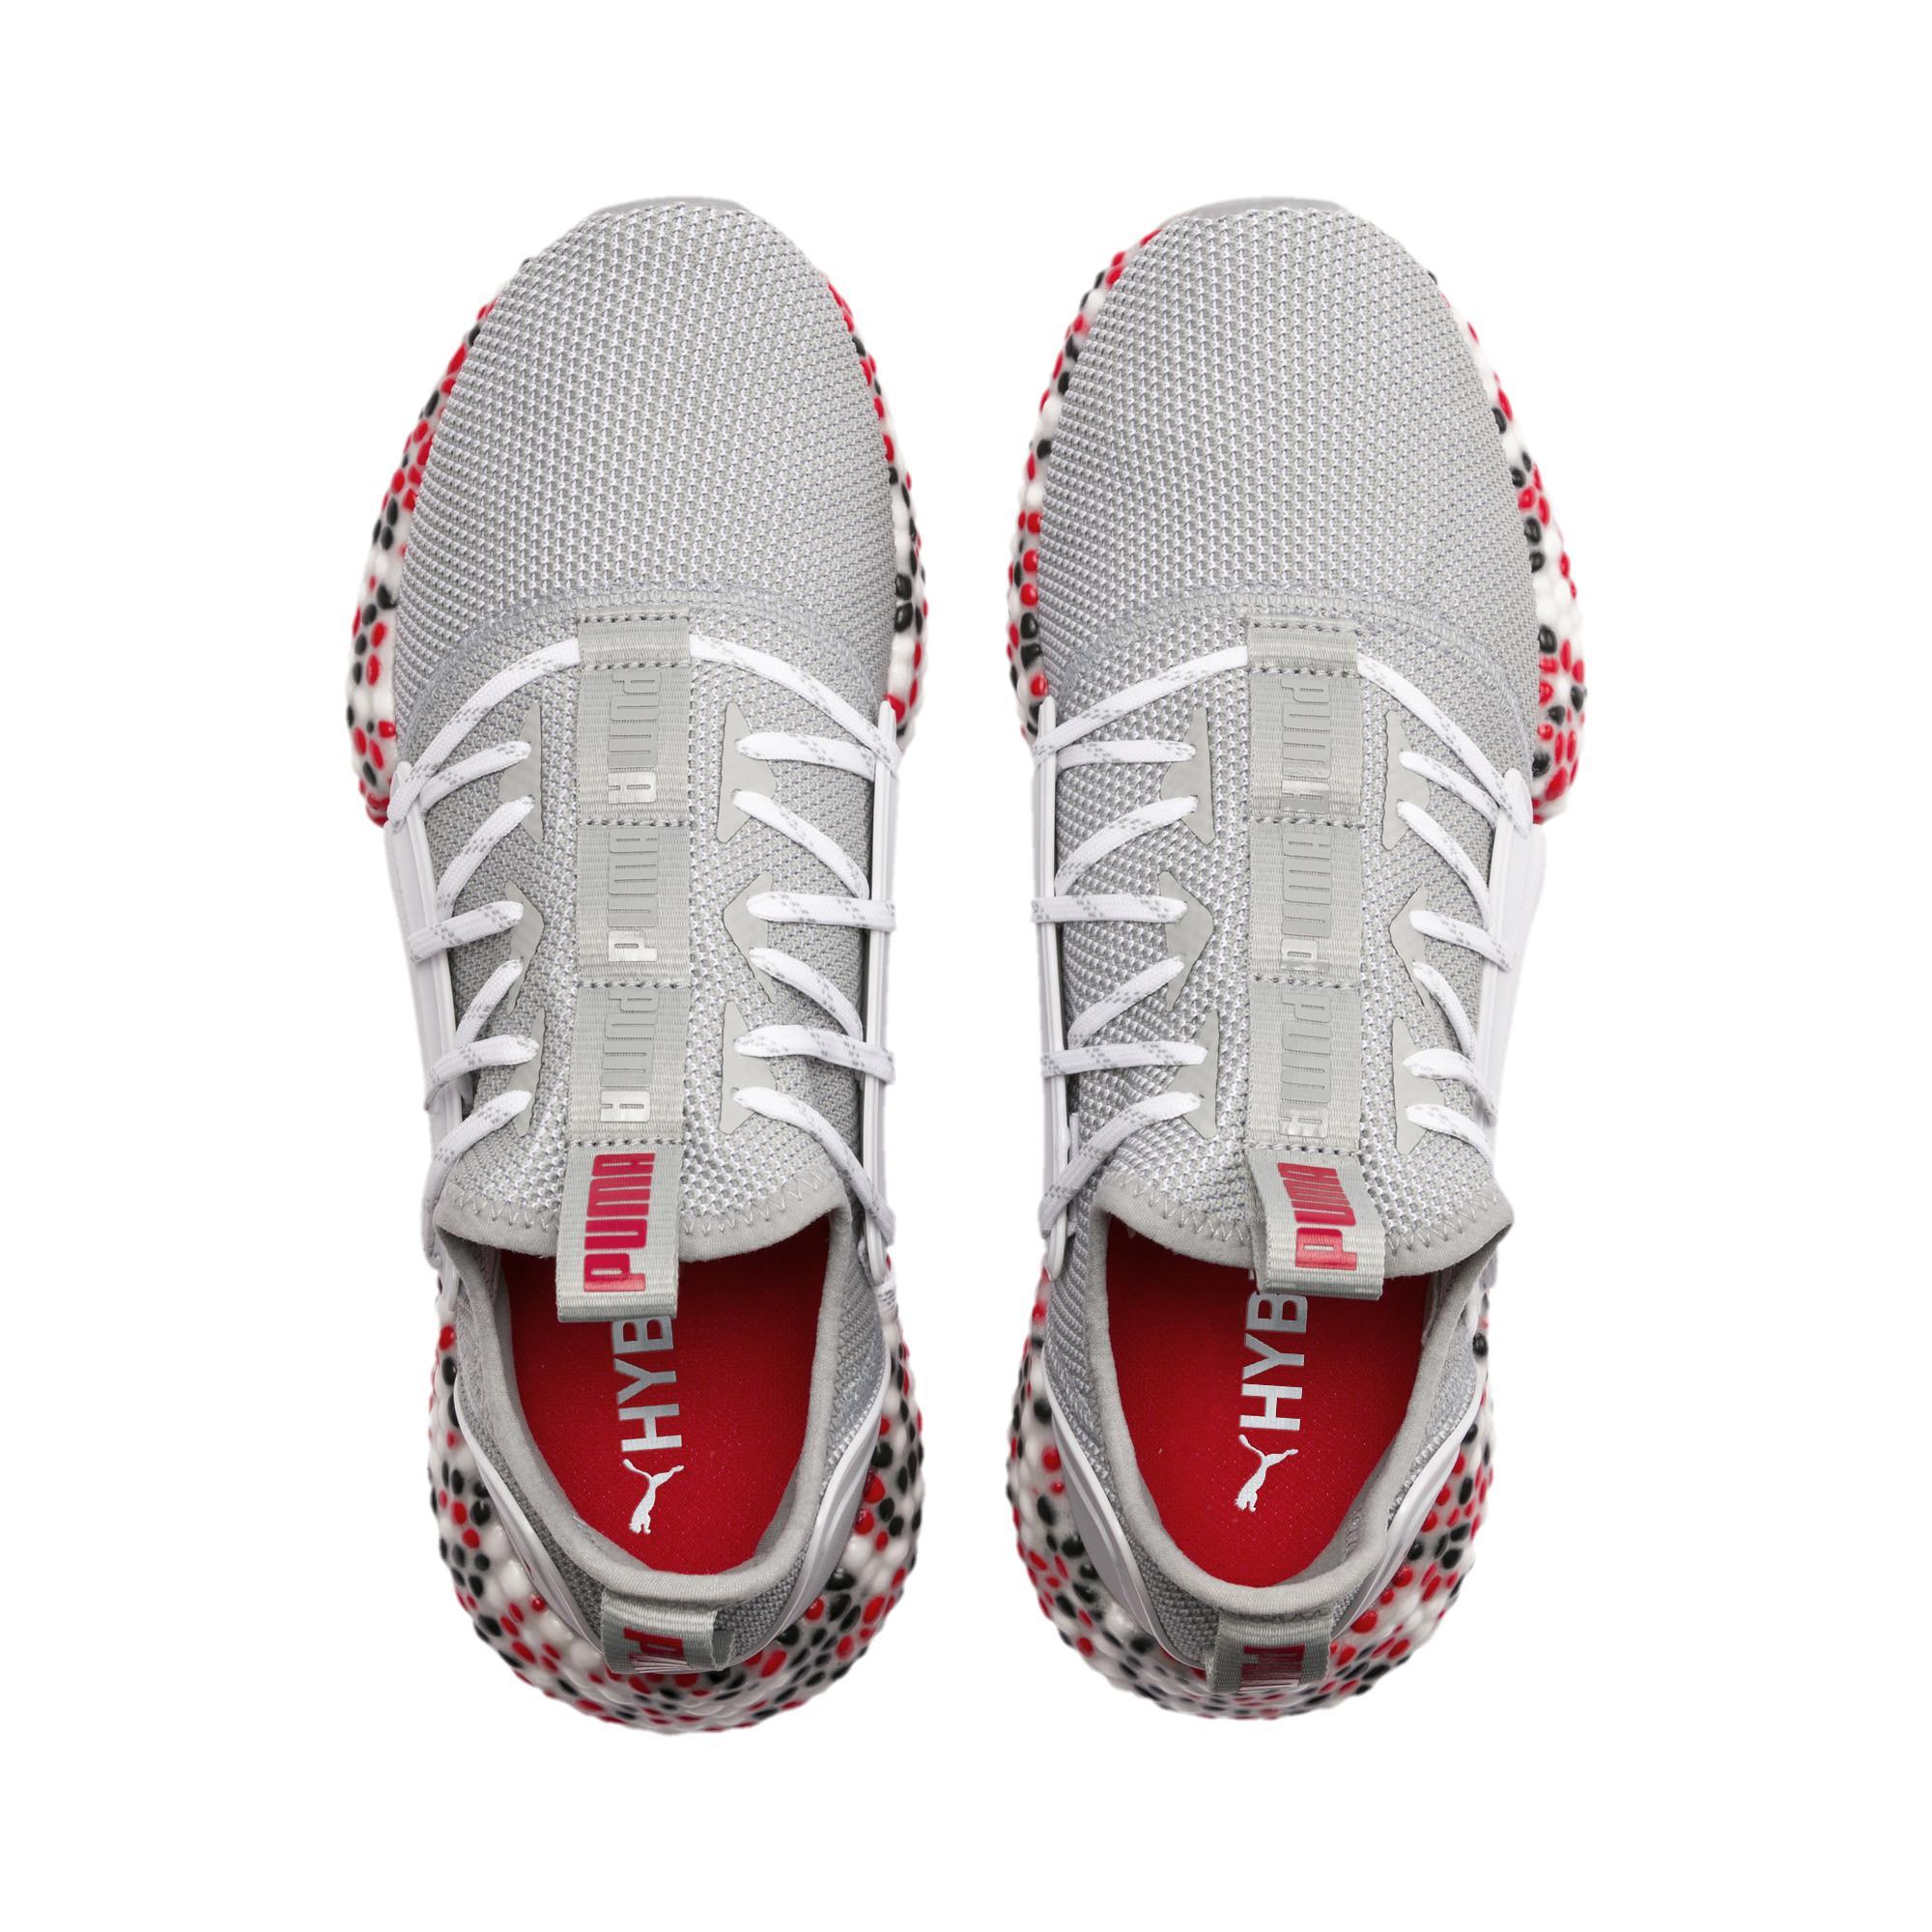 7c543552 Lyst - PUMA Hybrid Rocket Runner Men's Running Shoes for Men